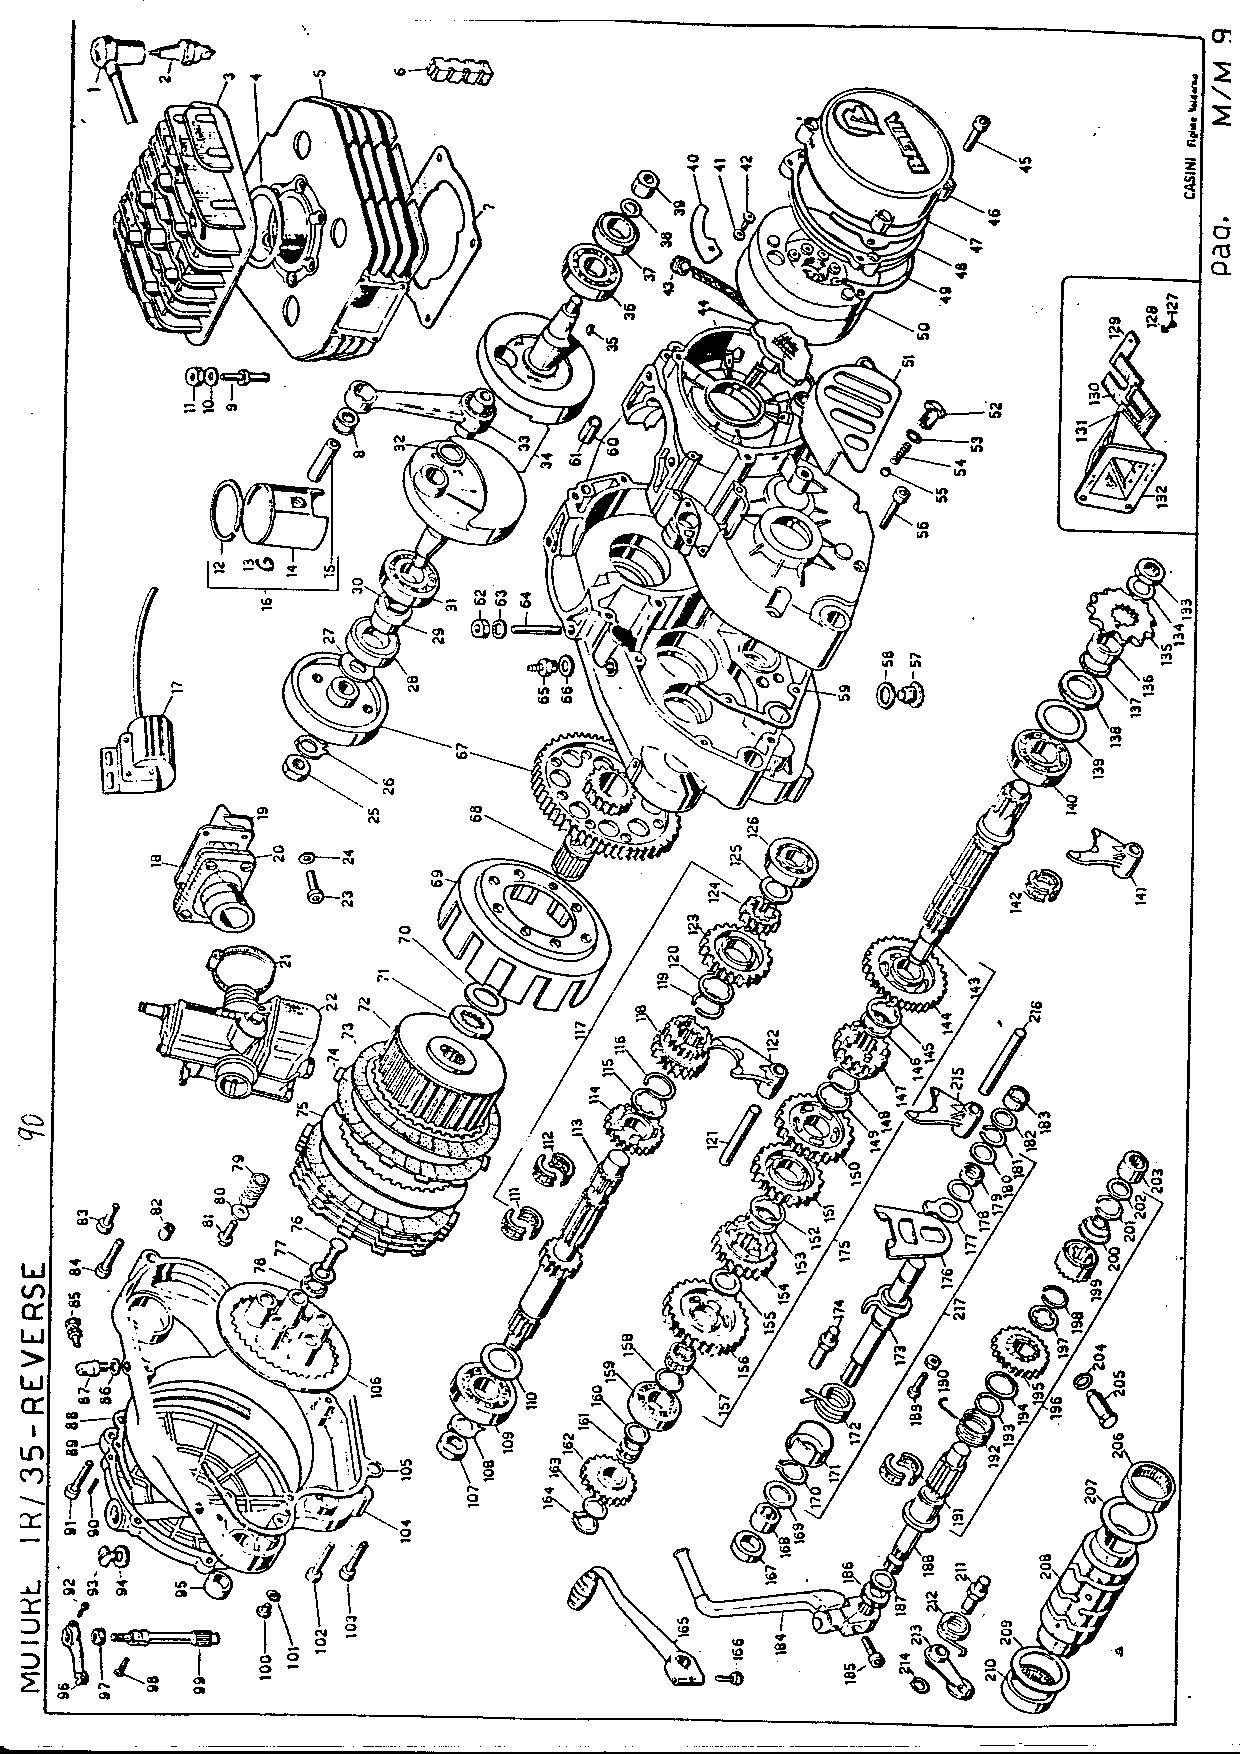 Beta TR35 Reverse 260 1990 Parts List PDF Download